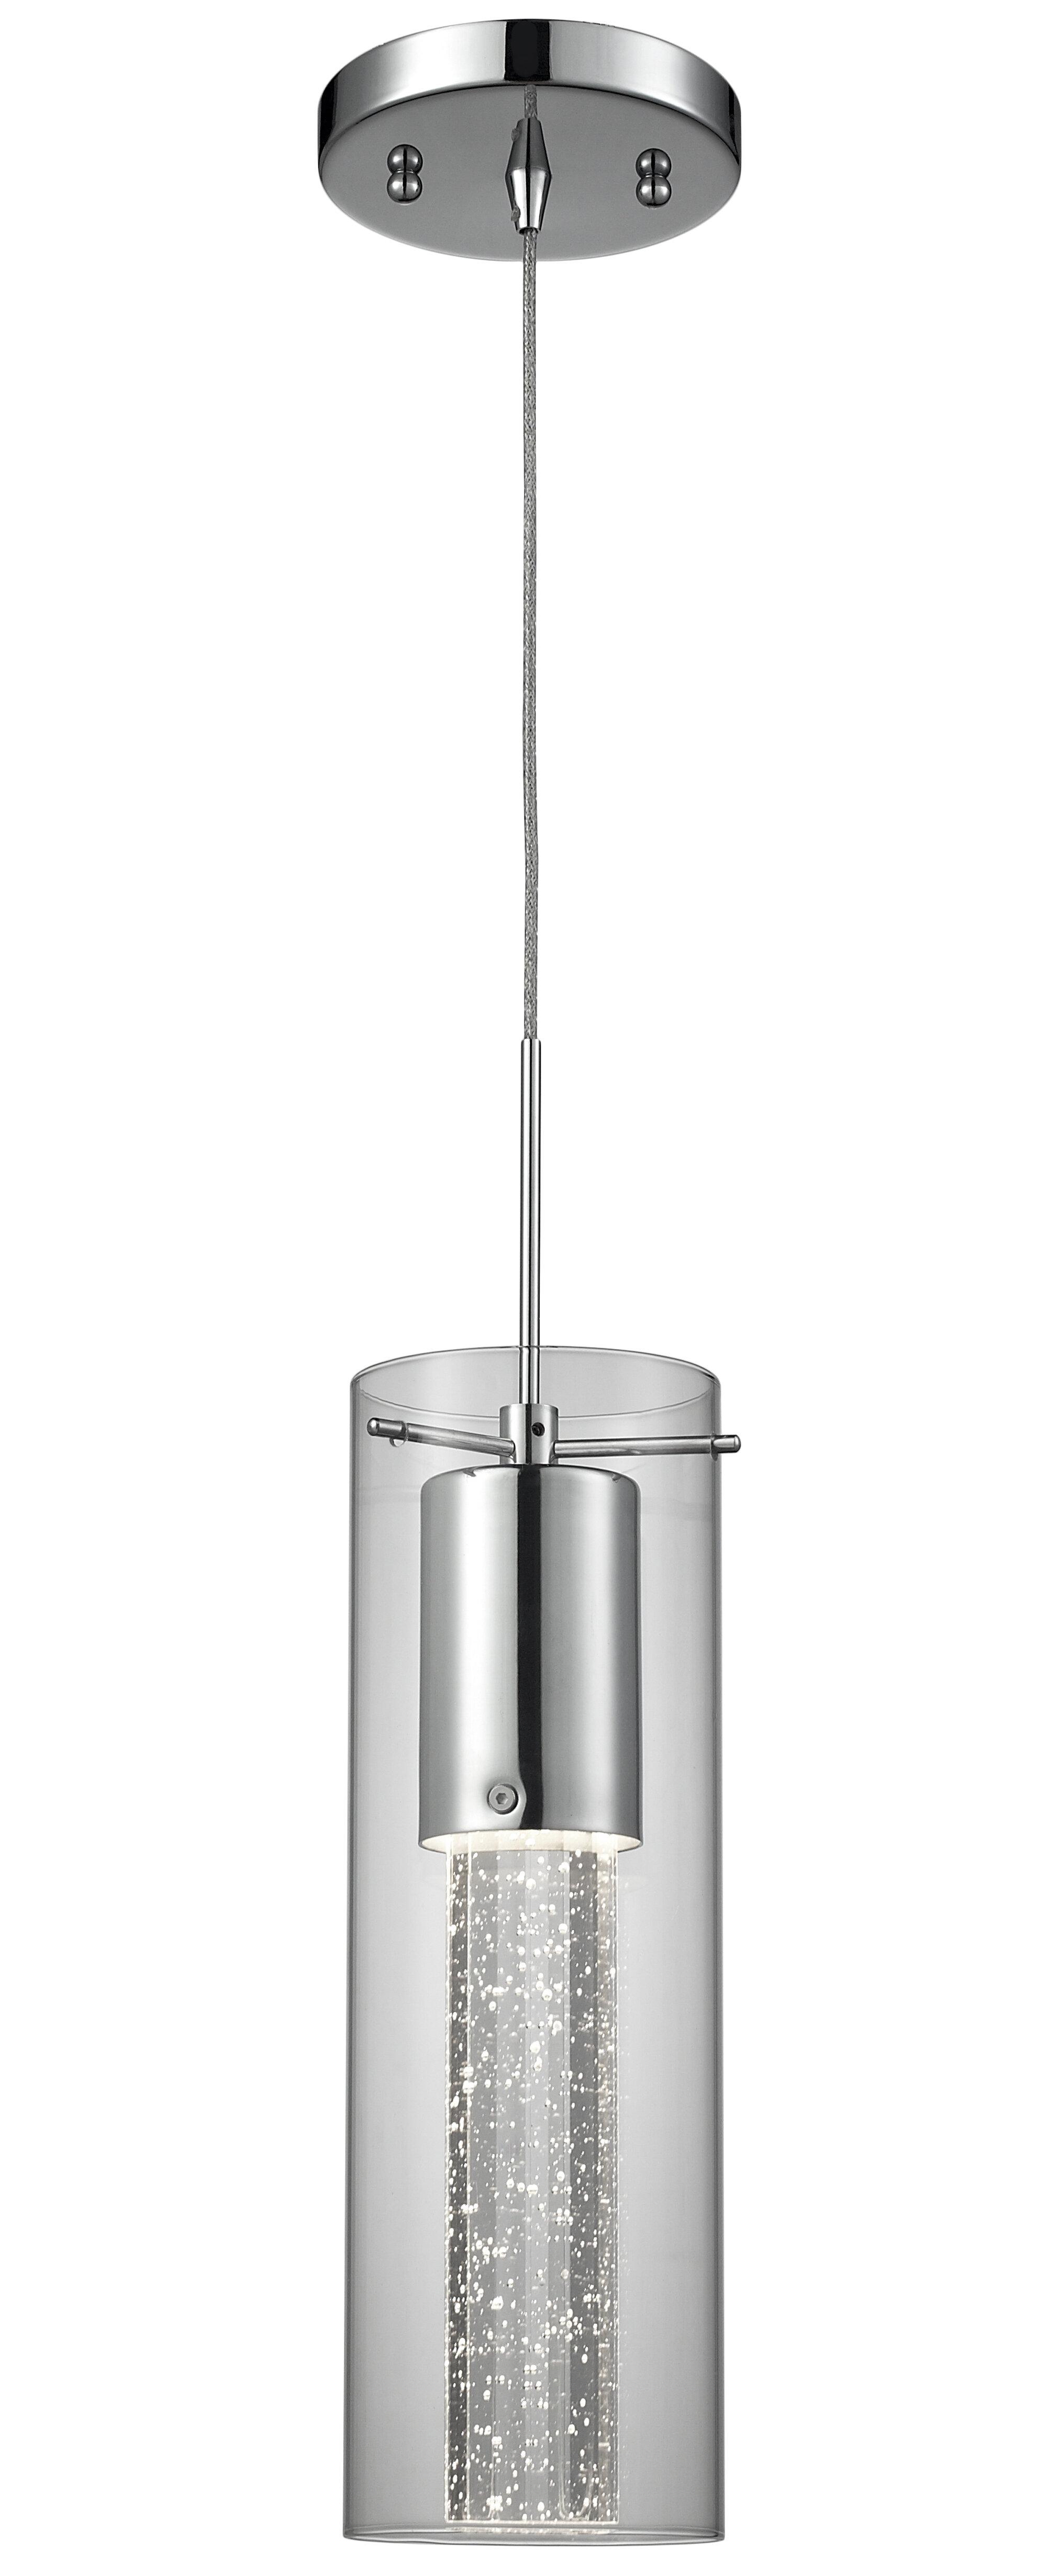 Epstein bubbles 1 light cylinder pendant